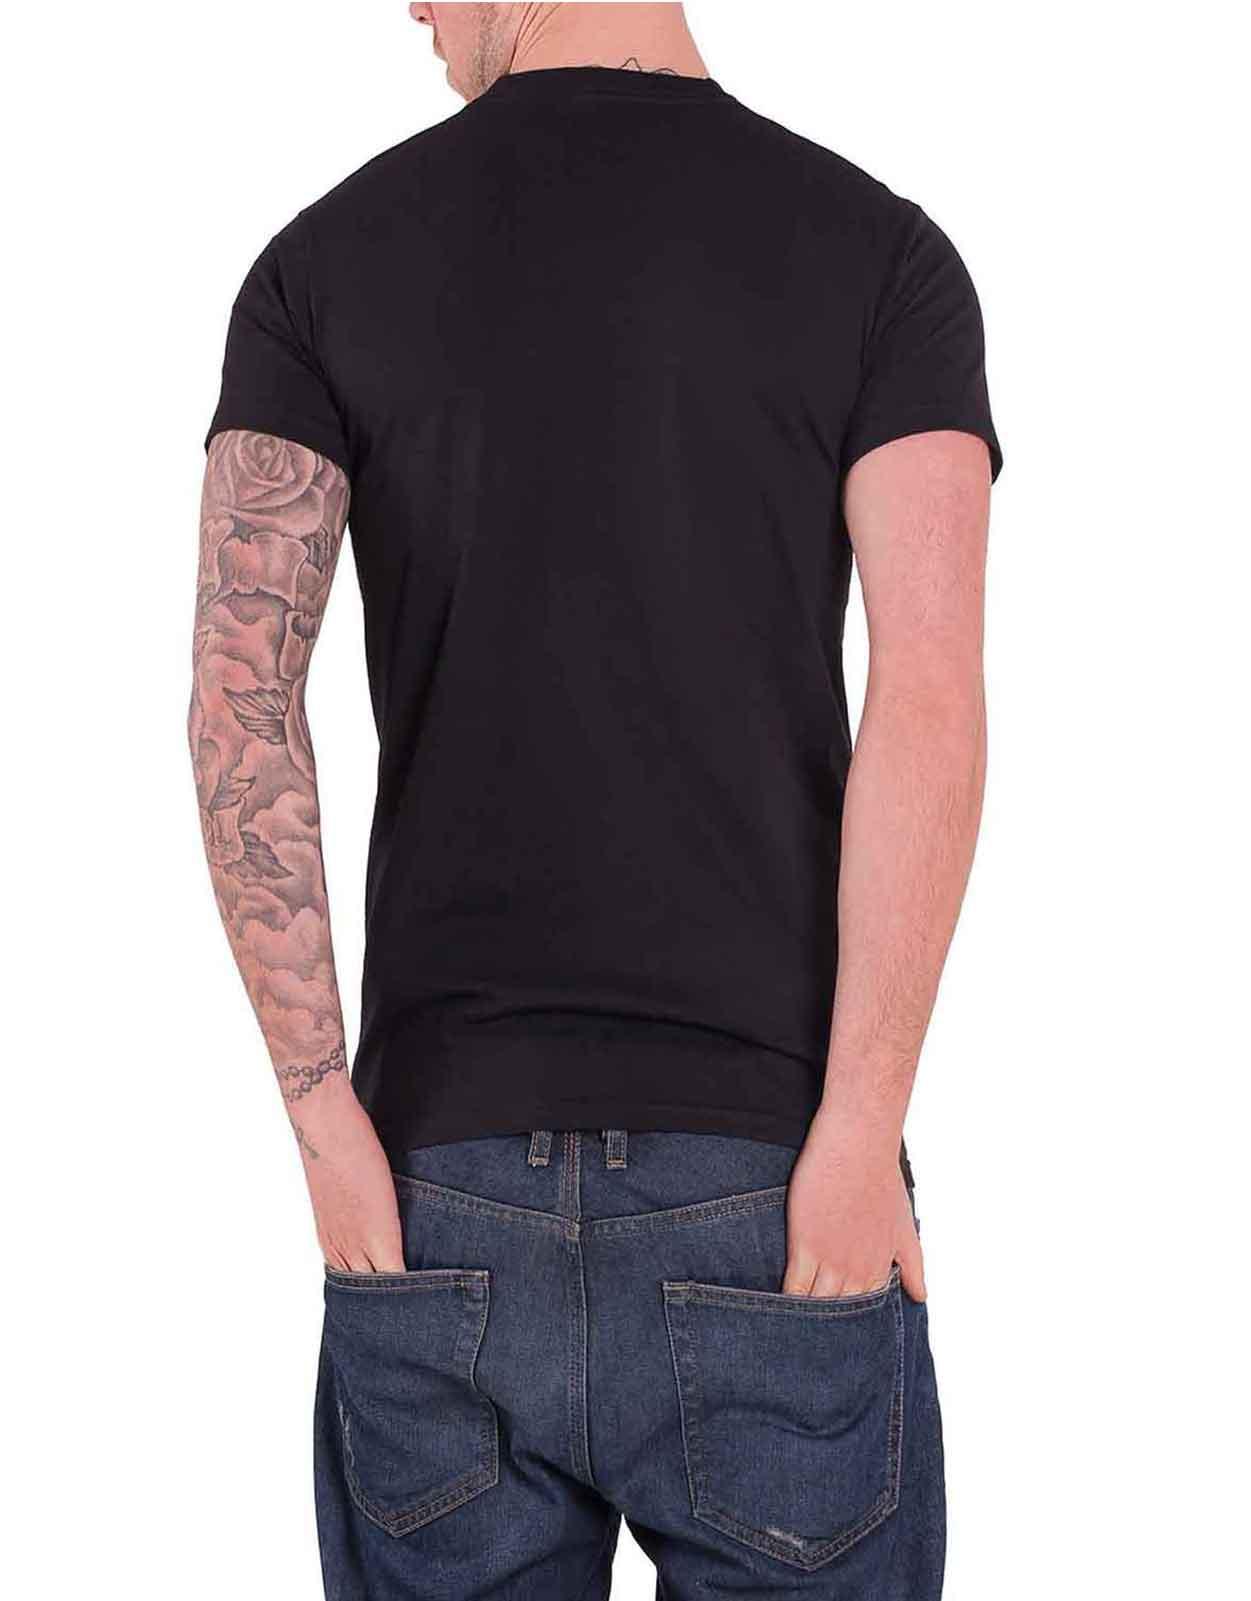 Motorhead-T-Shirt-Lemmy-RIP-England-warpig-clean-your-clock-official-new-mens Indexbild 31